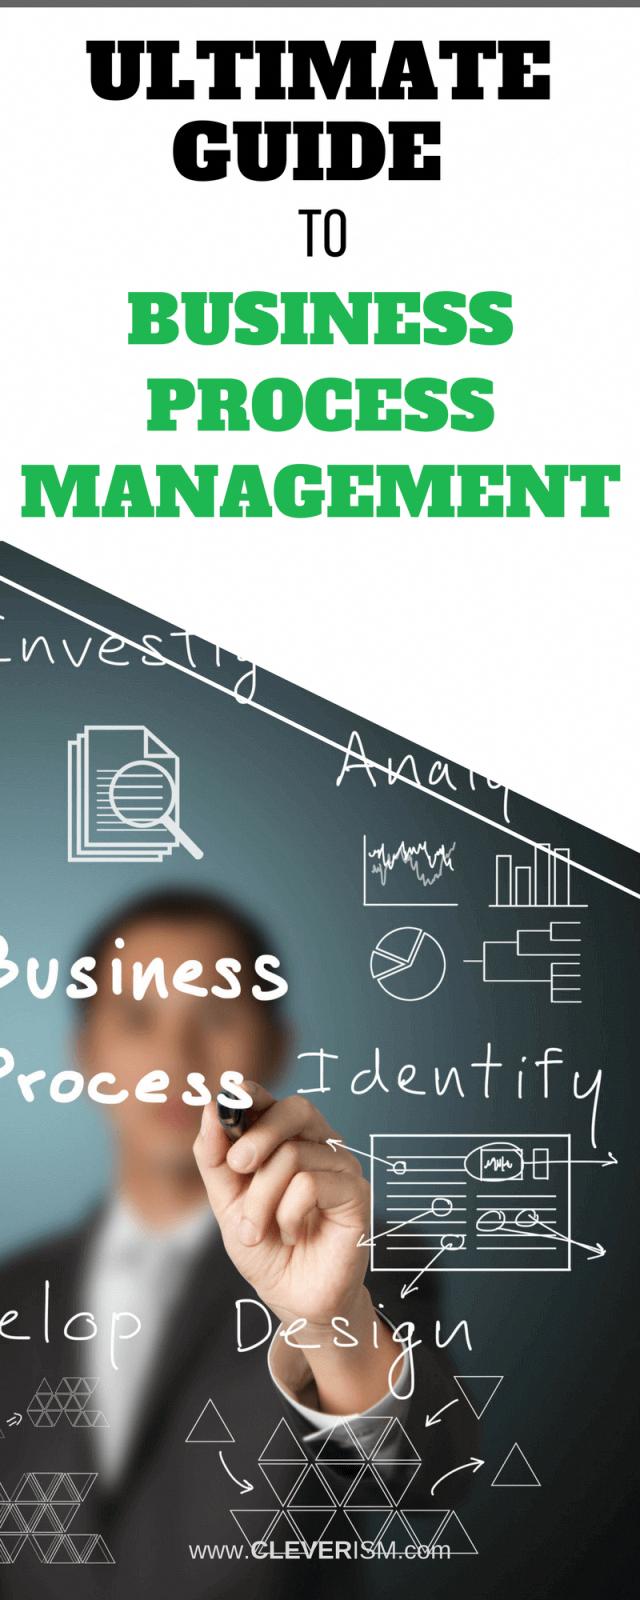 Business Management Associate Degree Jobs Whatcanyoudowithabusinessdegree Business Process Management Business Process Business Management Degree